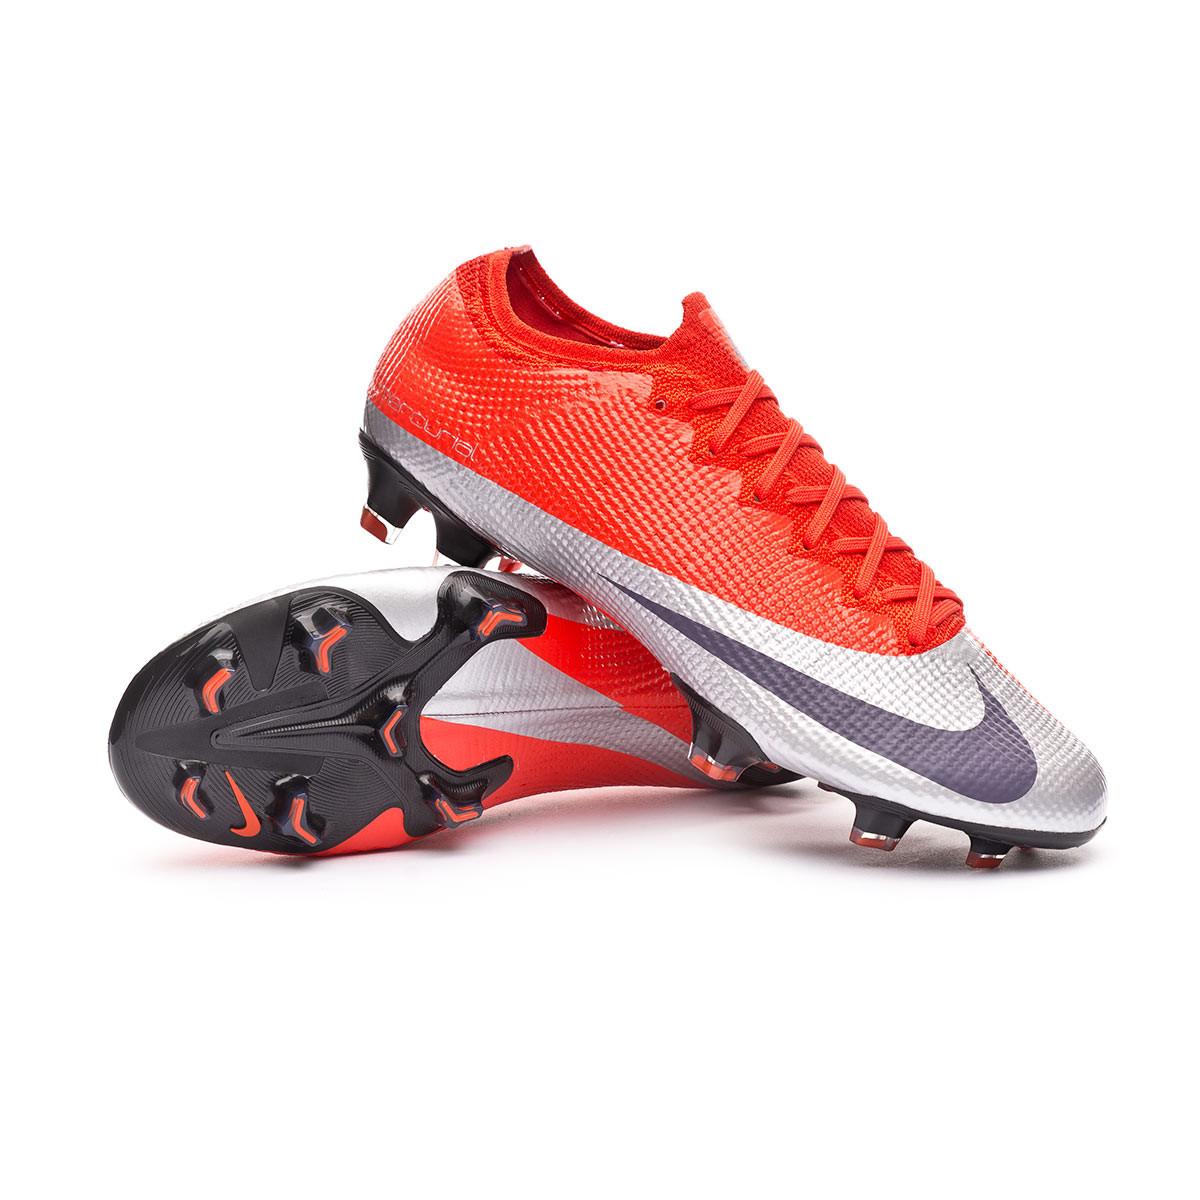 ama de casa Funeral Mula  Football Boots Nike Mercurial Vapor XIII Elite FG Max orange-Metallic  silver-Black - Football store Fútbol Emotion